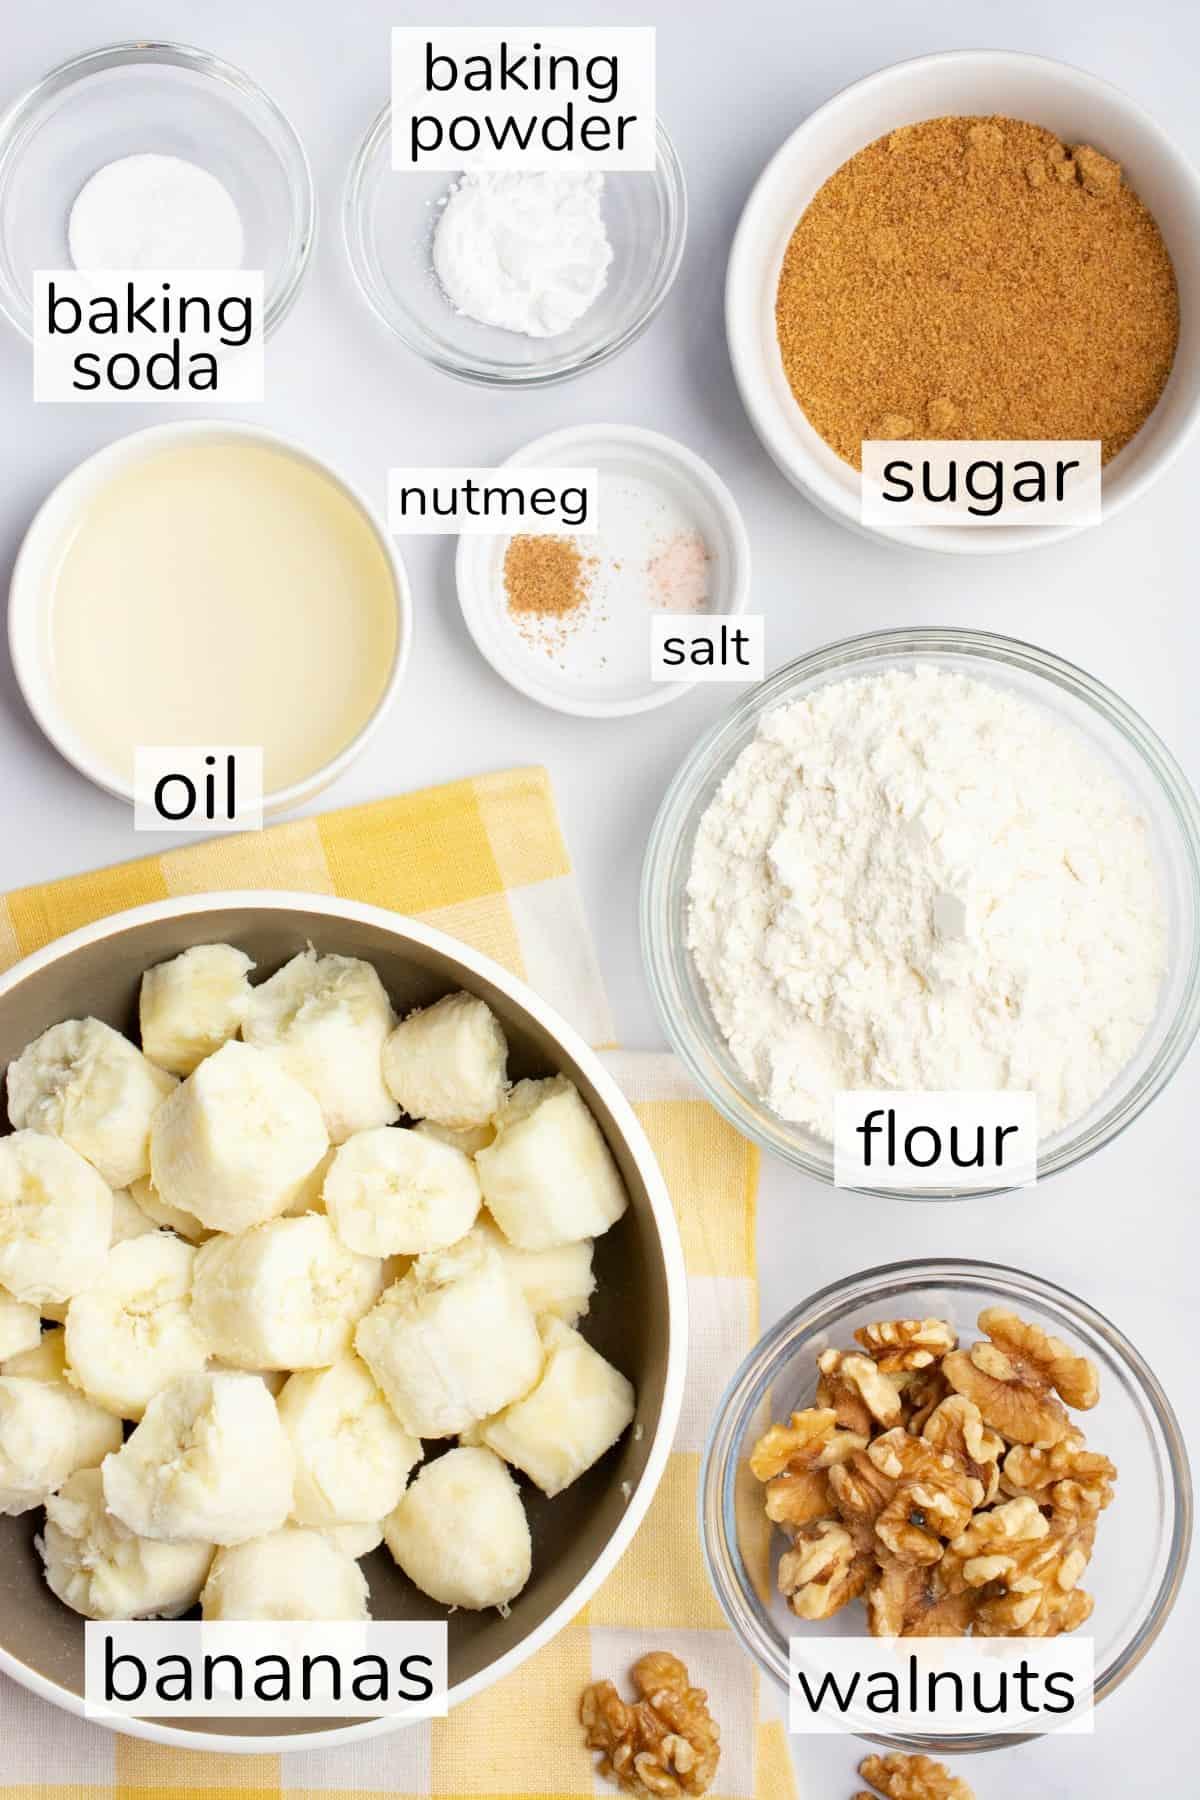 Labeled ingredients in bowls for vegan banana bread.